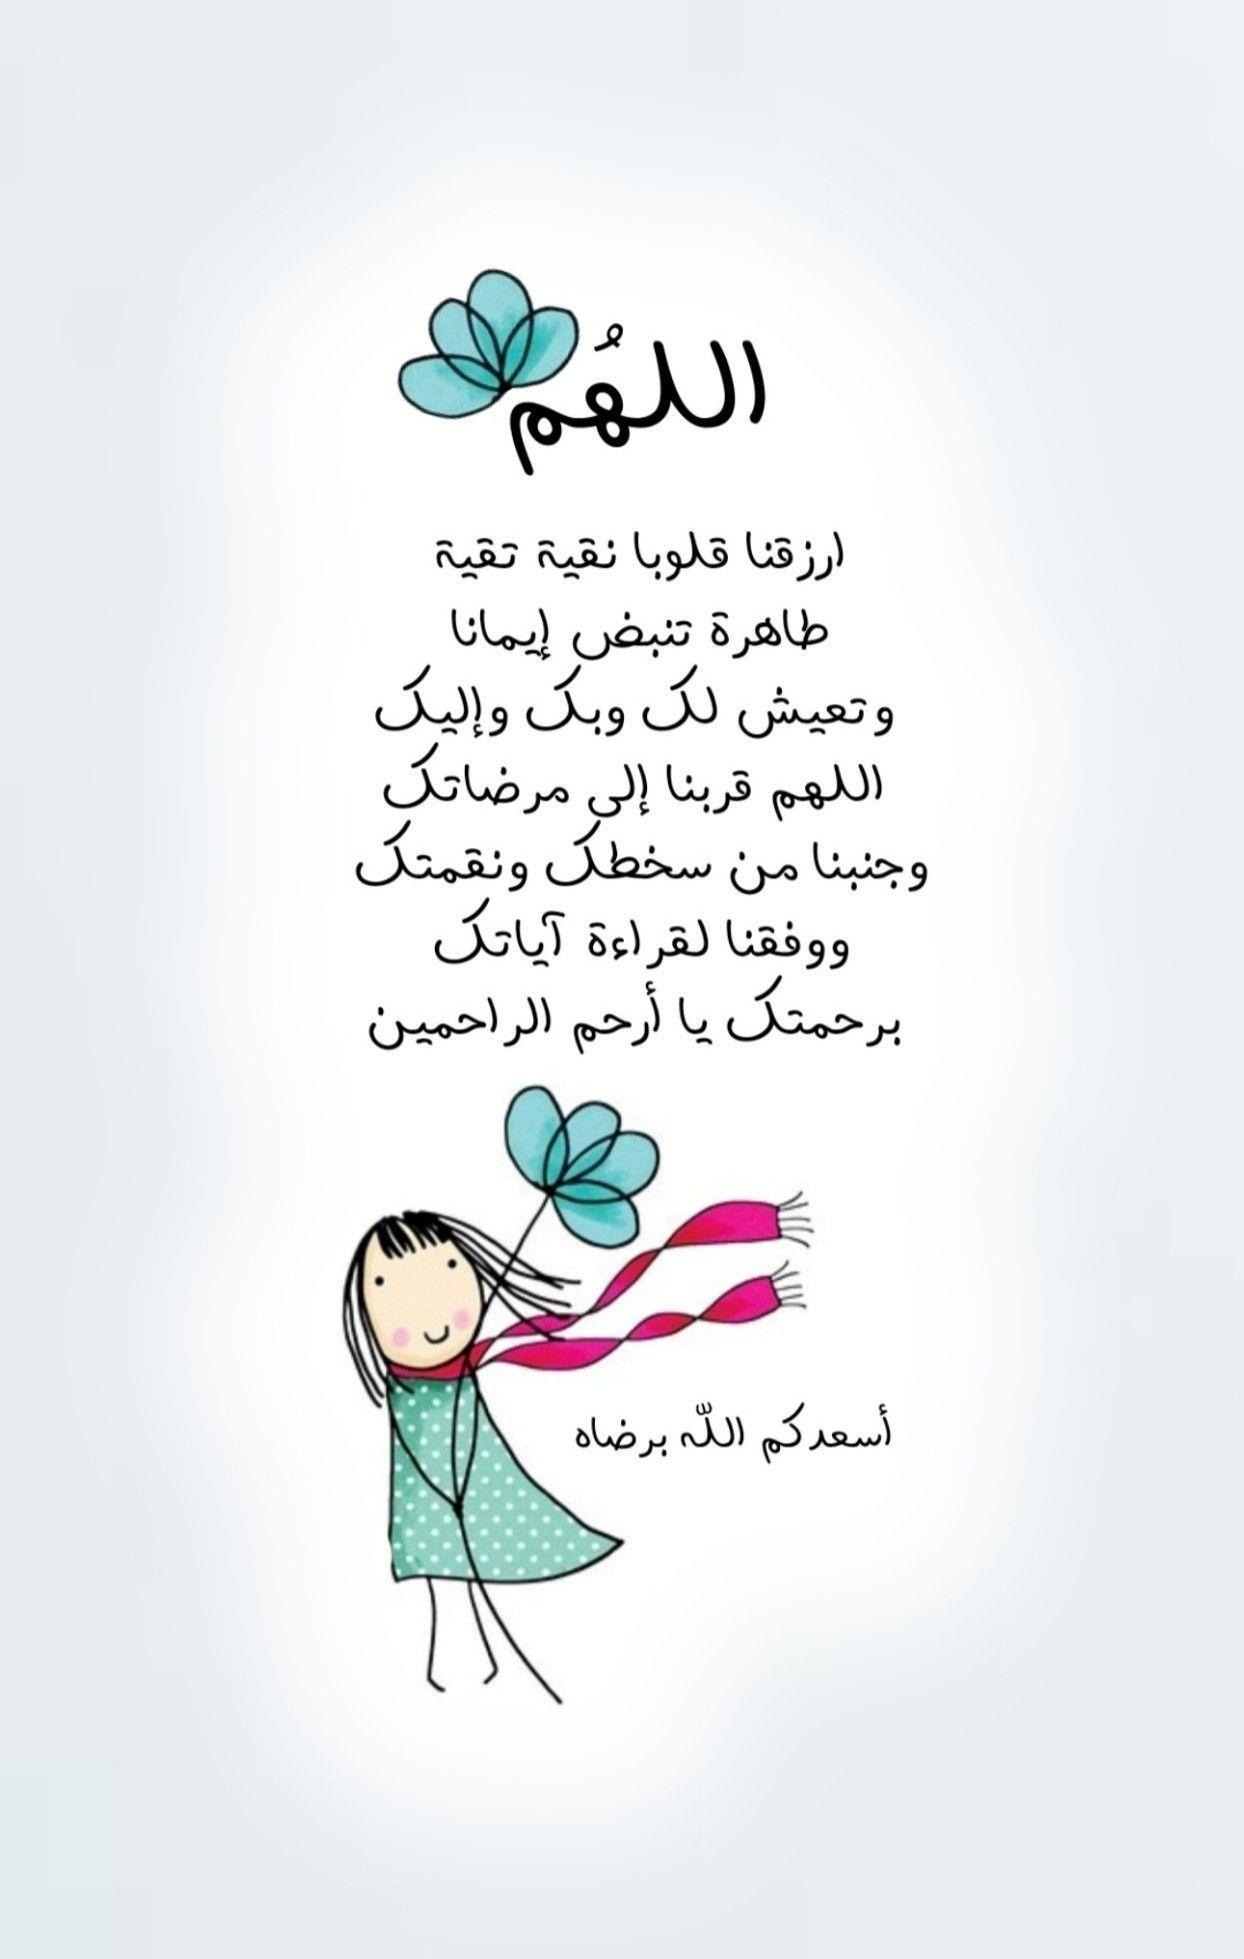 صور دعاء يوم الجمعة Morning Greetings Quotes Quotes For Book Lovers Positive Vibes Quotes